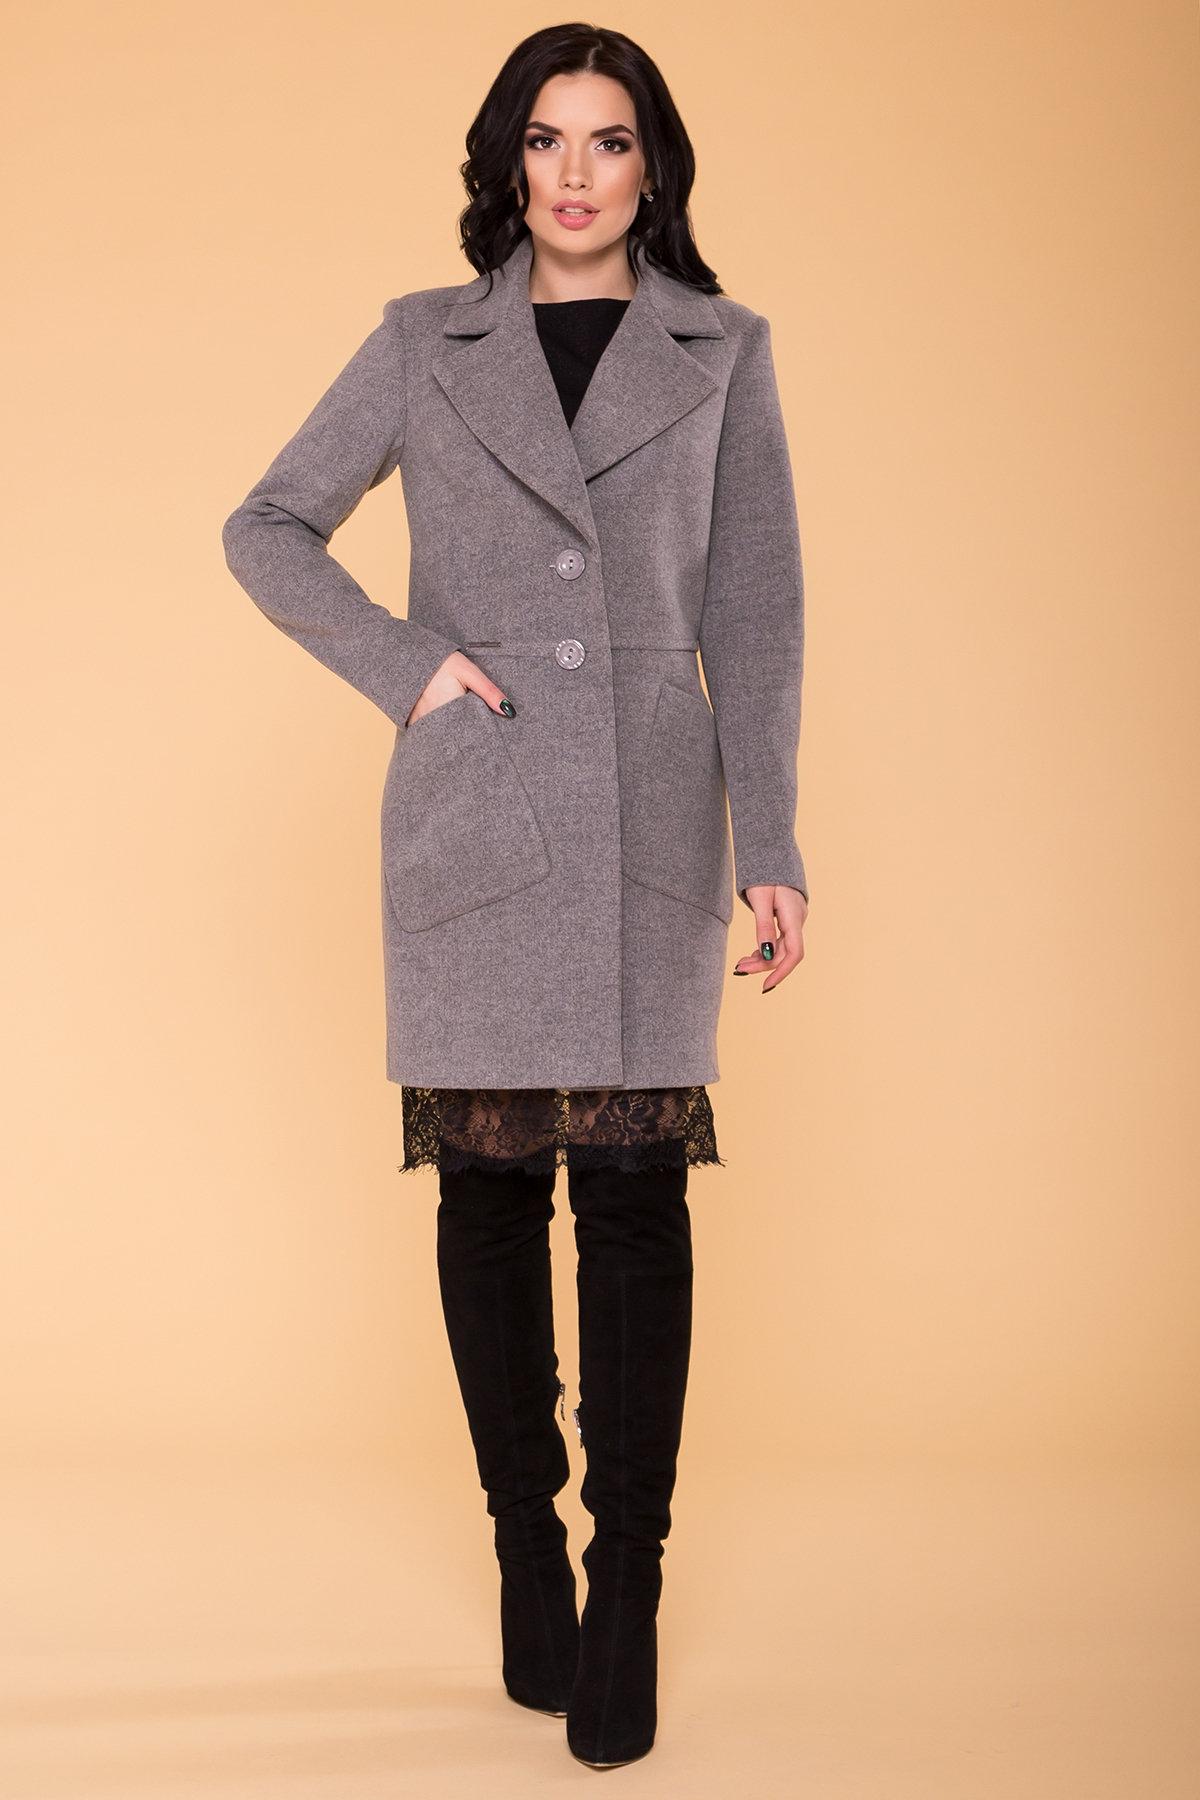 Пальто Габриэлла 4417 АРТ. 21204 Цвет: Серый 18 - фото 4, интернет магазин tm-modus.ru